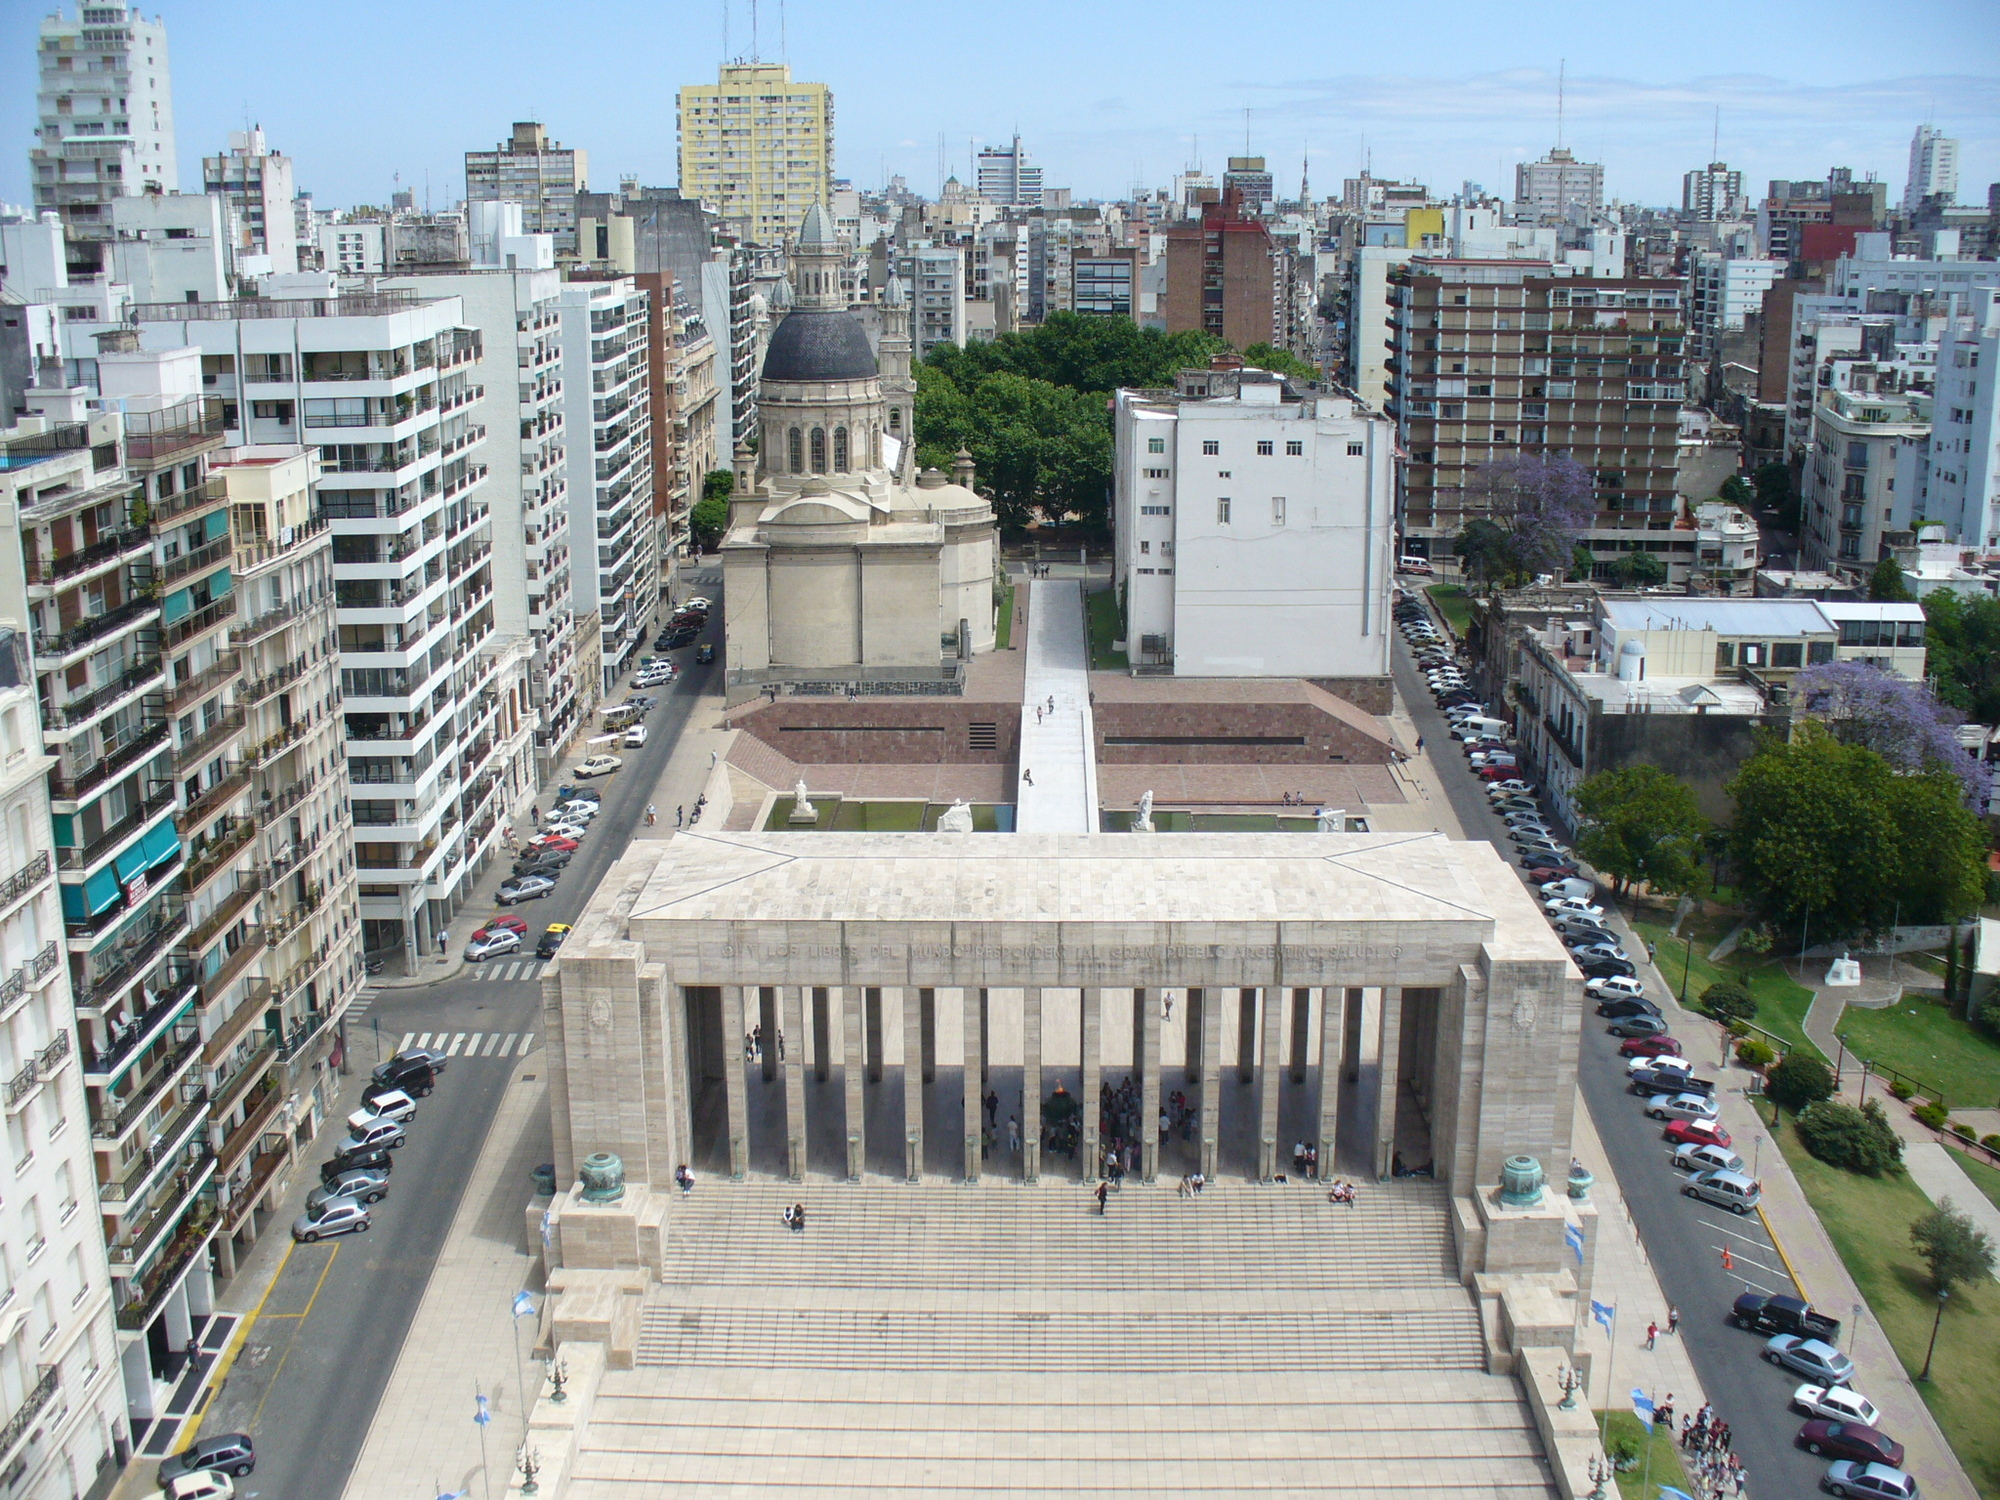 Gu a de arquitectura en rosario 12 sitios que todo for Paginas de chimentos de argentina